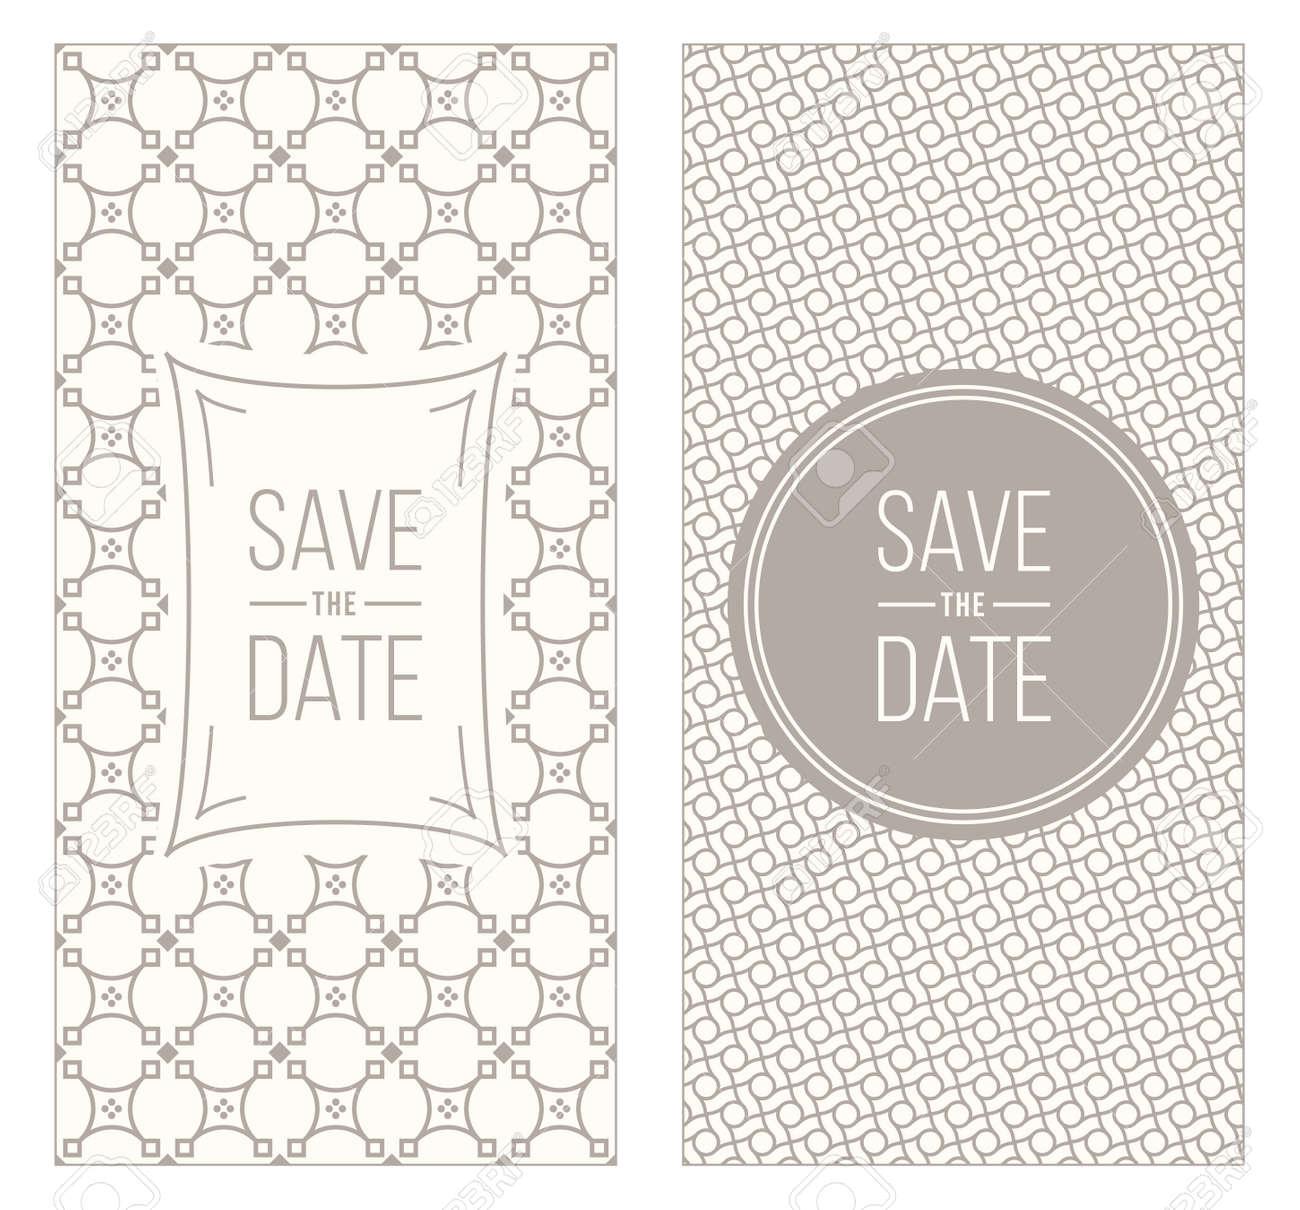 Two Retro Vintage Wedding Invitation Templates - Abstract Geometric ...